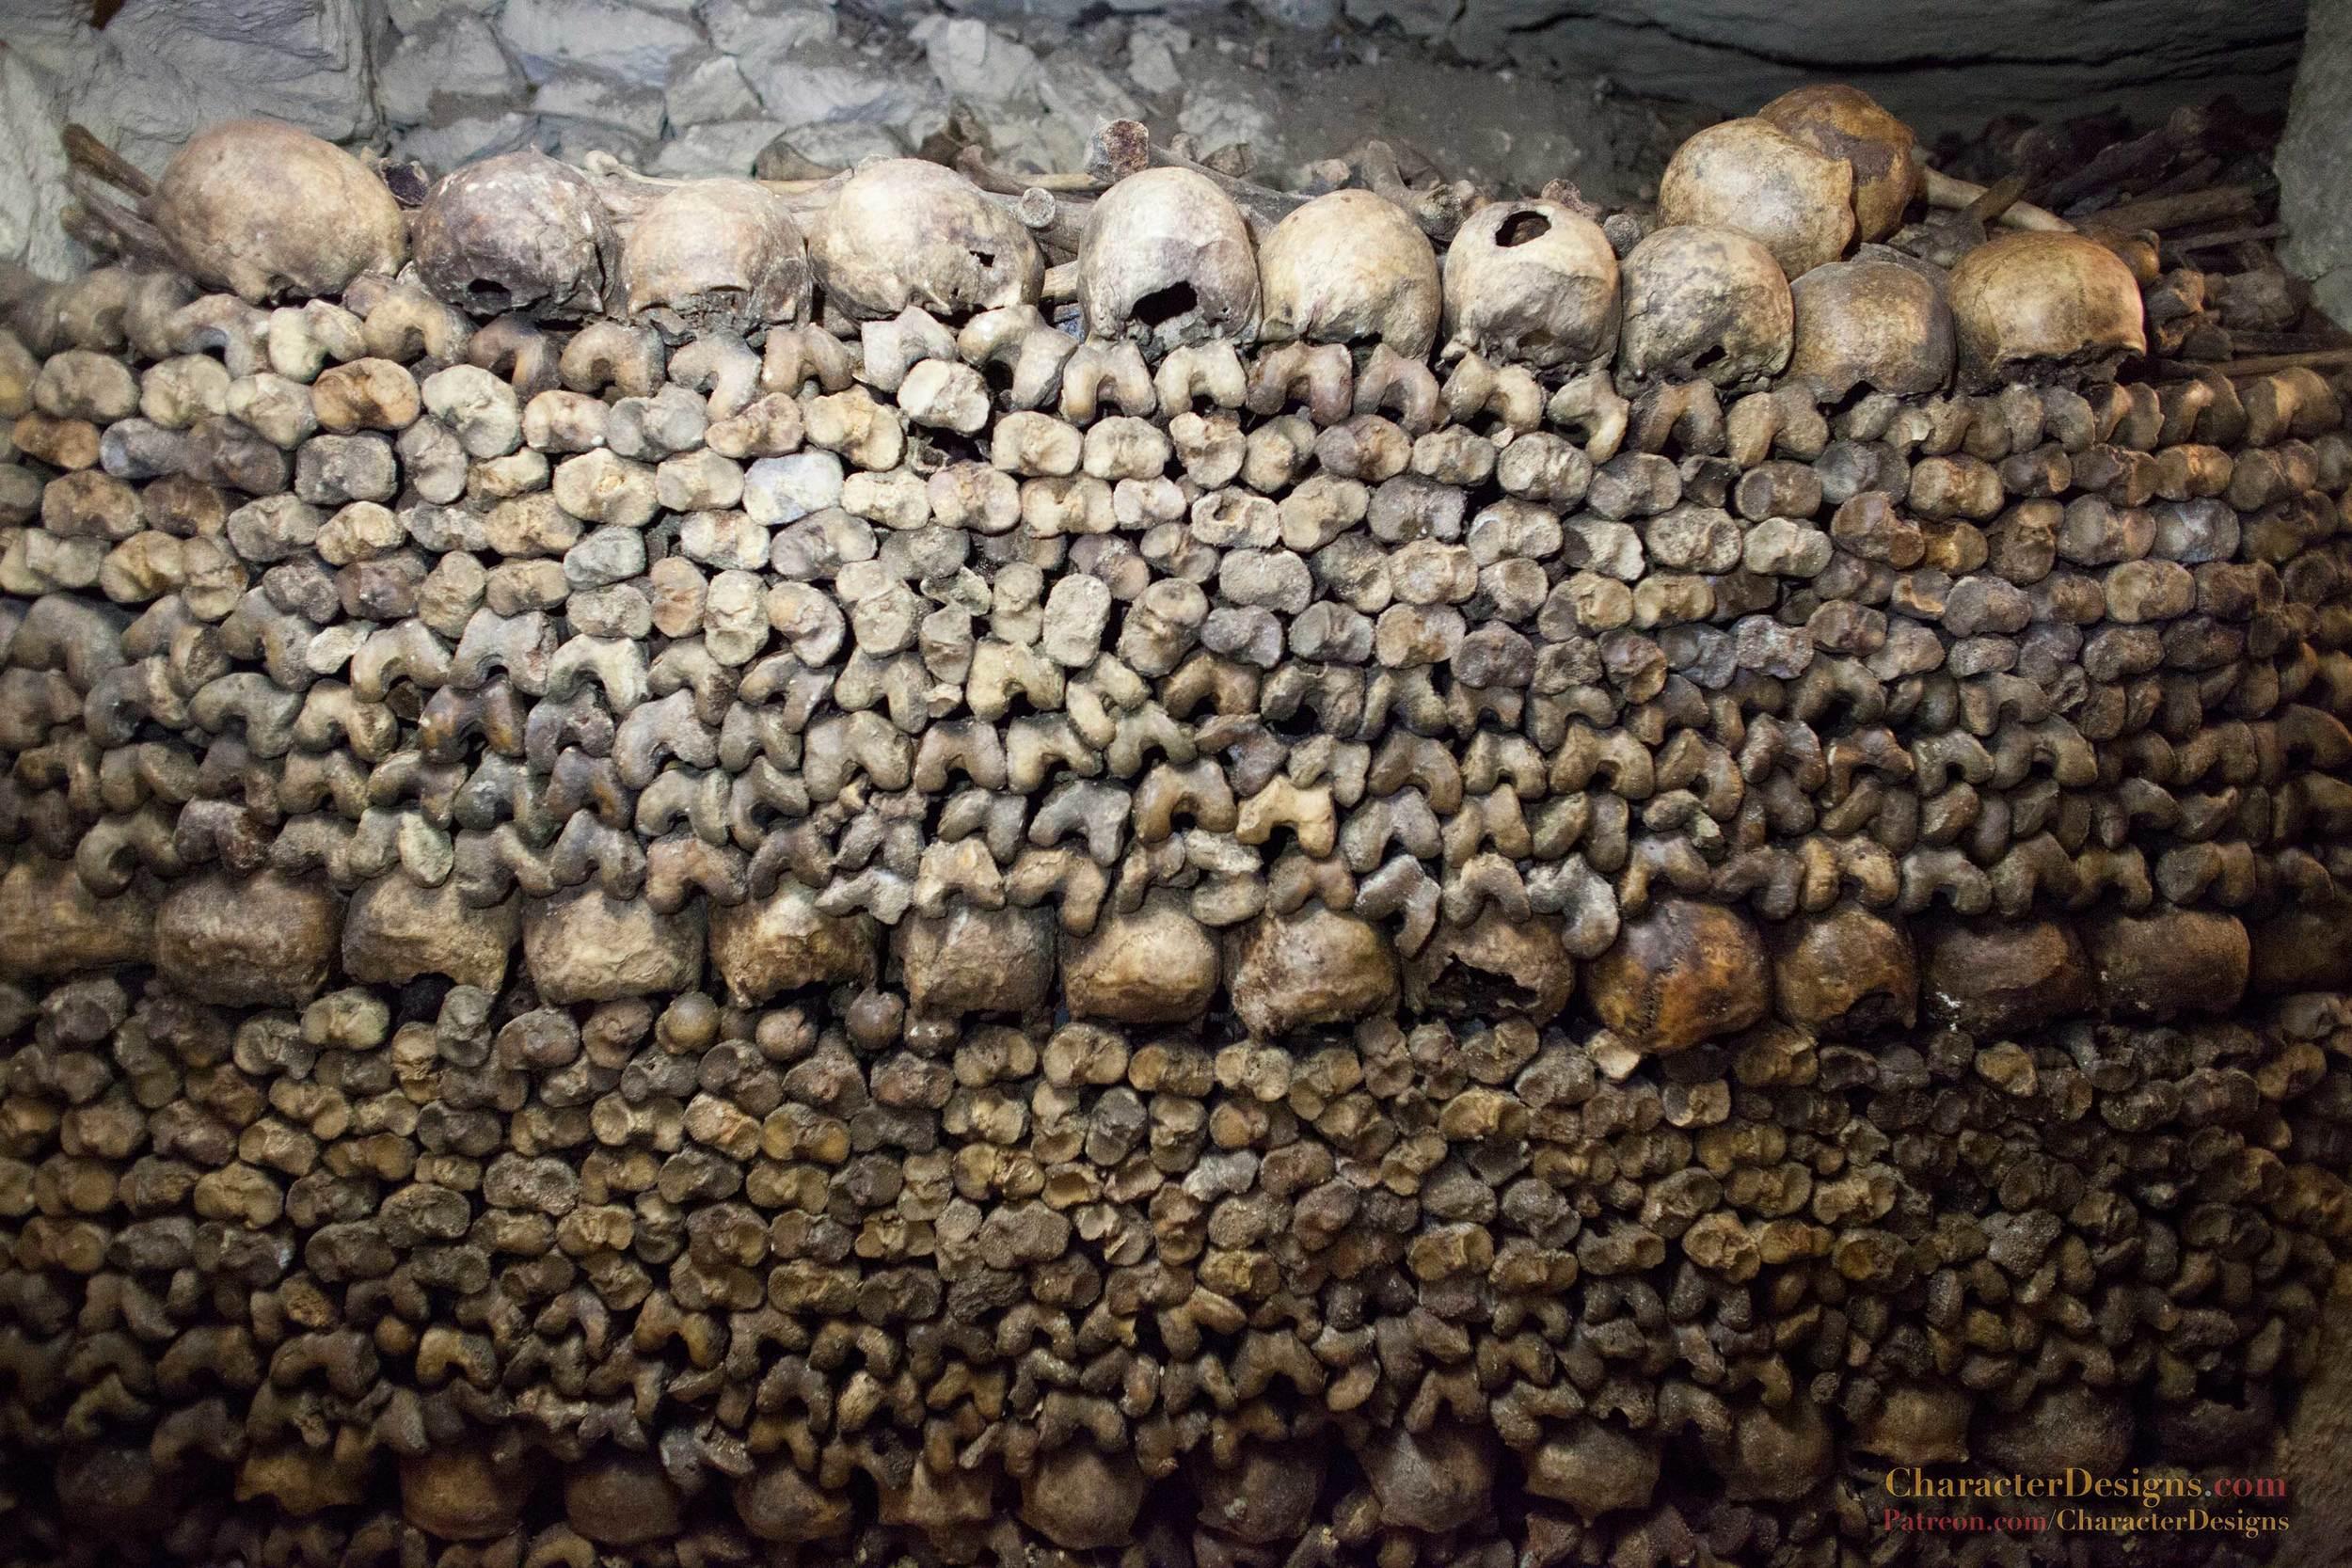 Catacombs_061.jpg